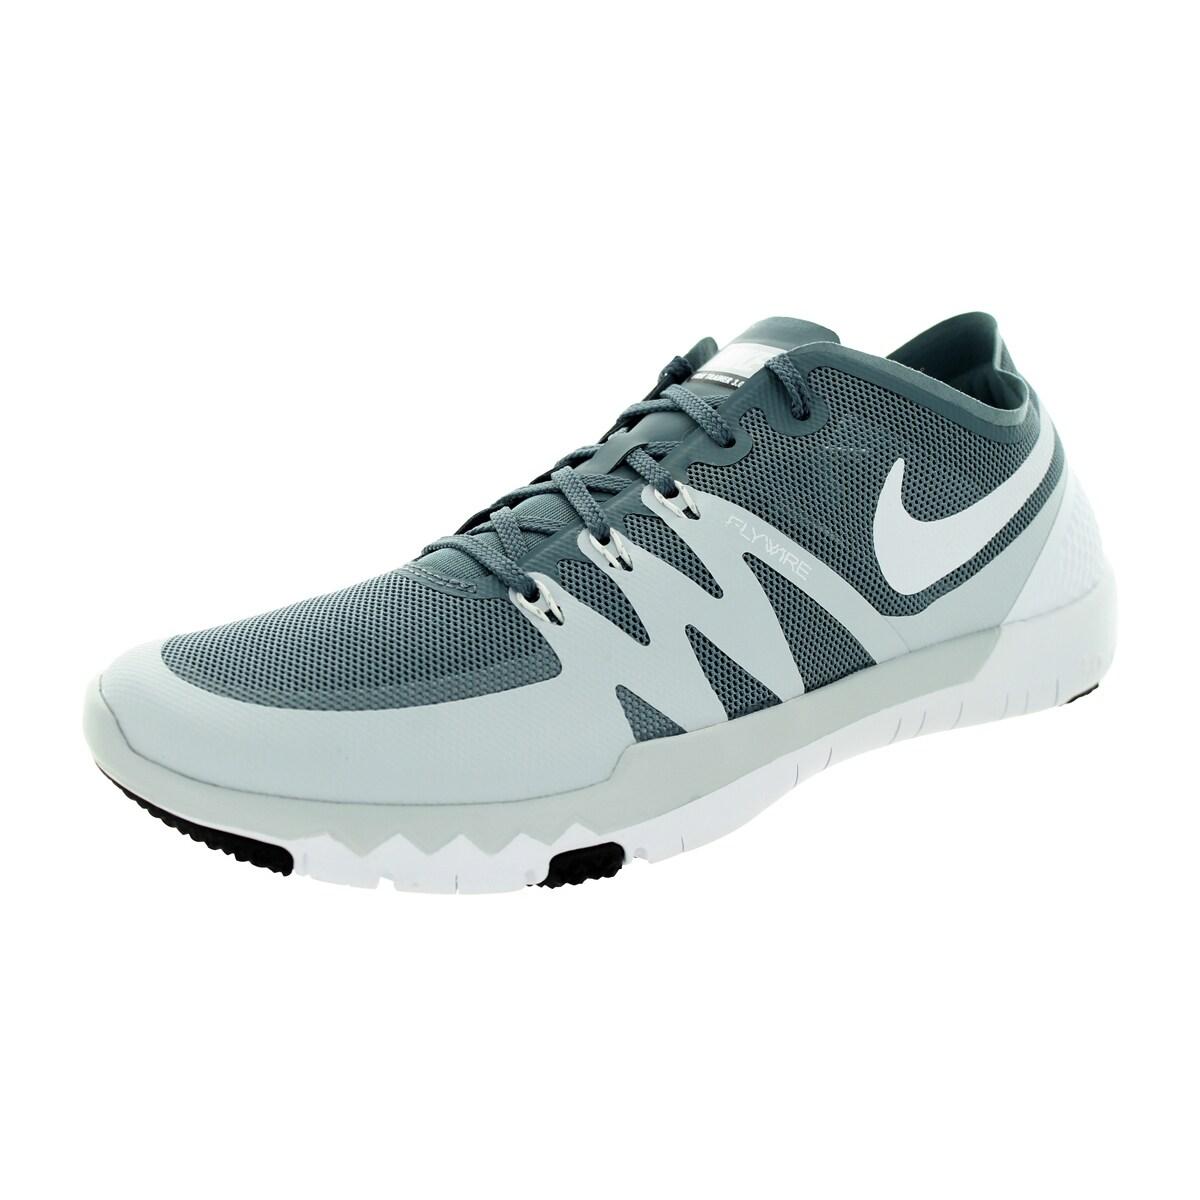 Nike Trainer 3.0 V3 - Mens - Blue Graphite/Pure Platinum/...